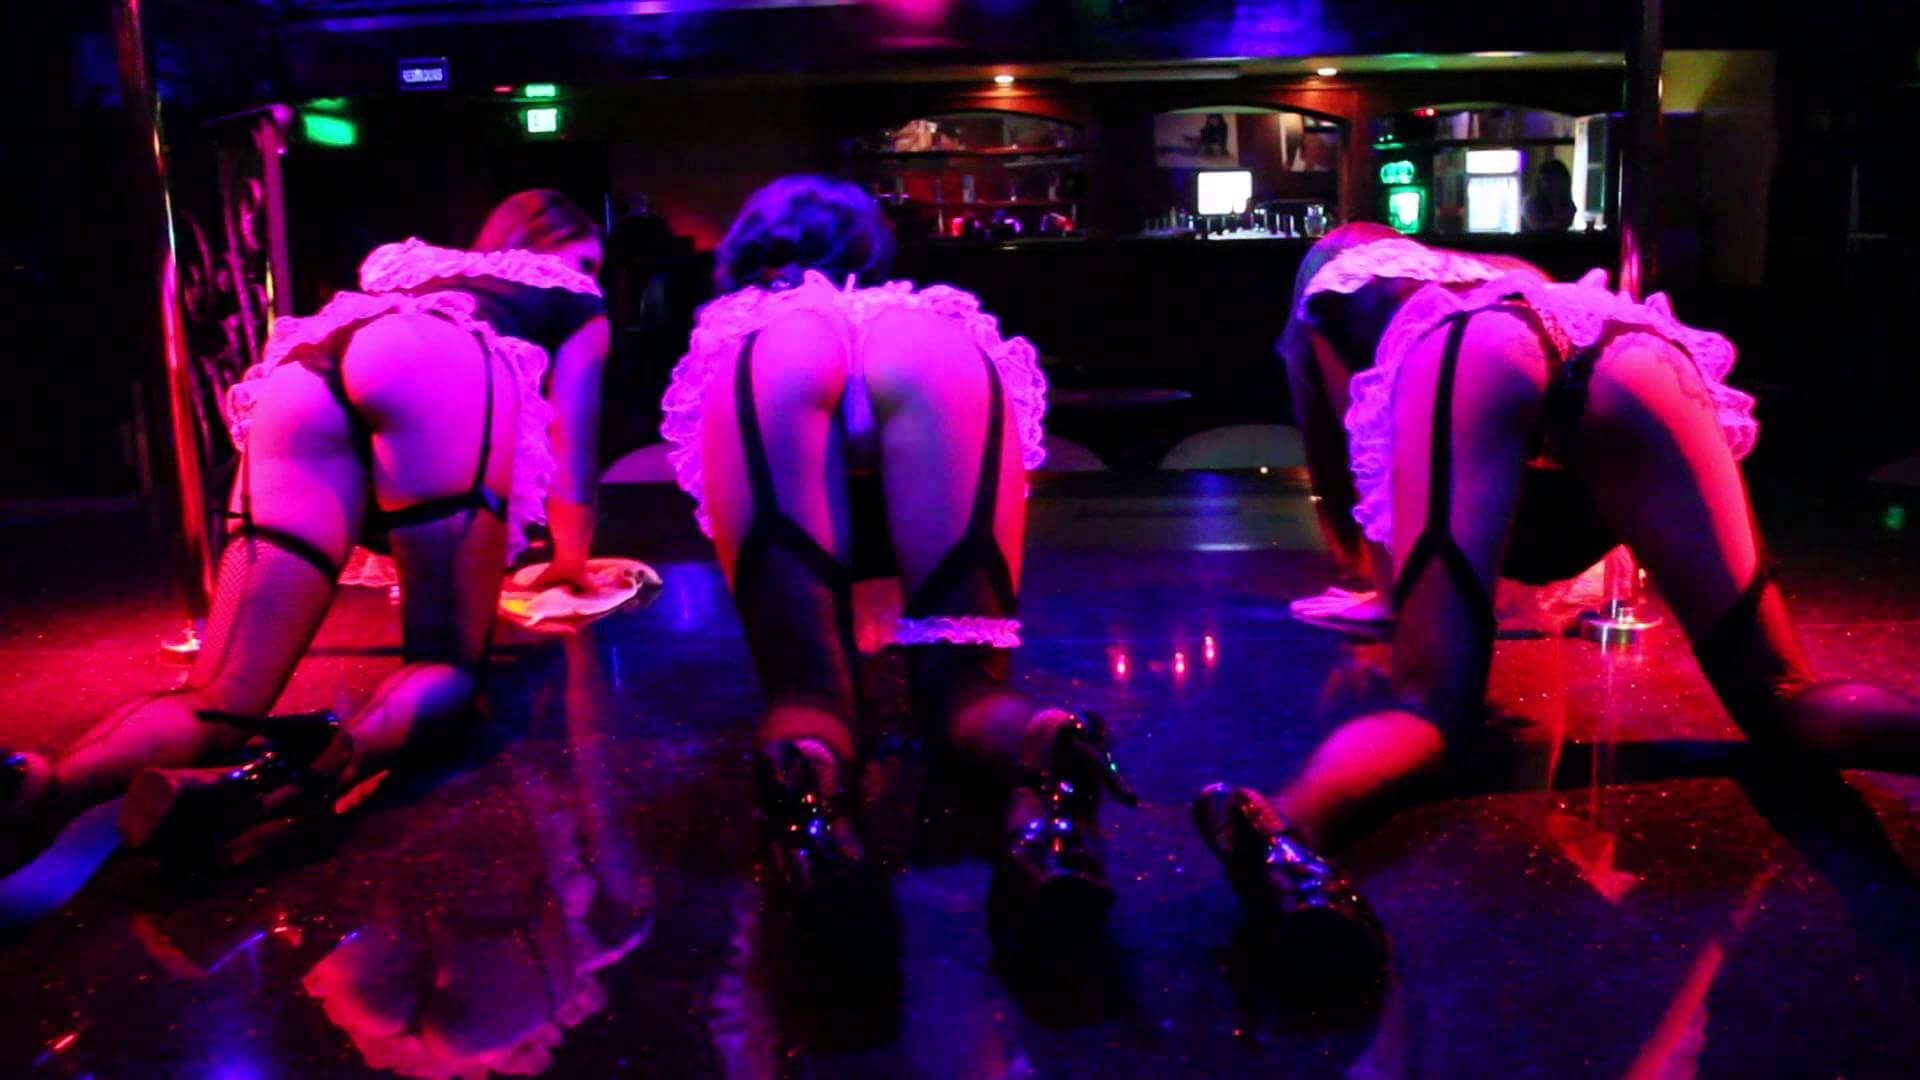 Ass milf las vegas nude strip clubs yeas